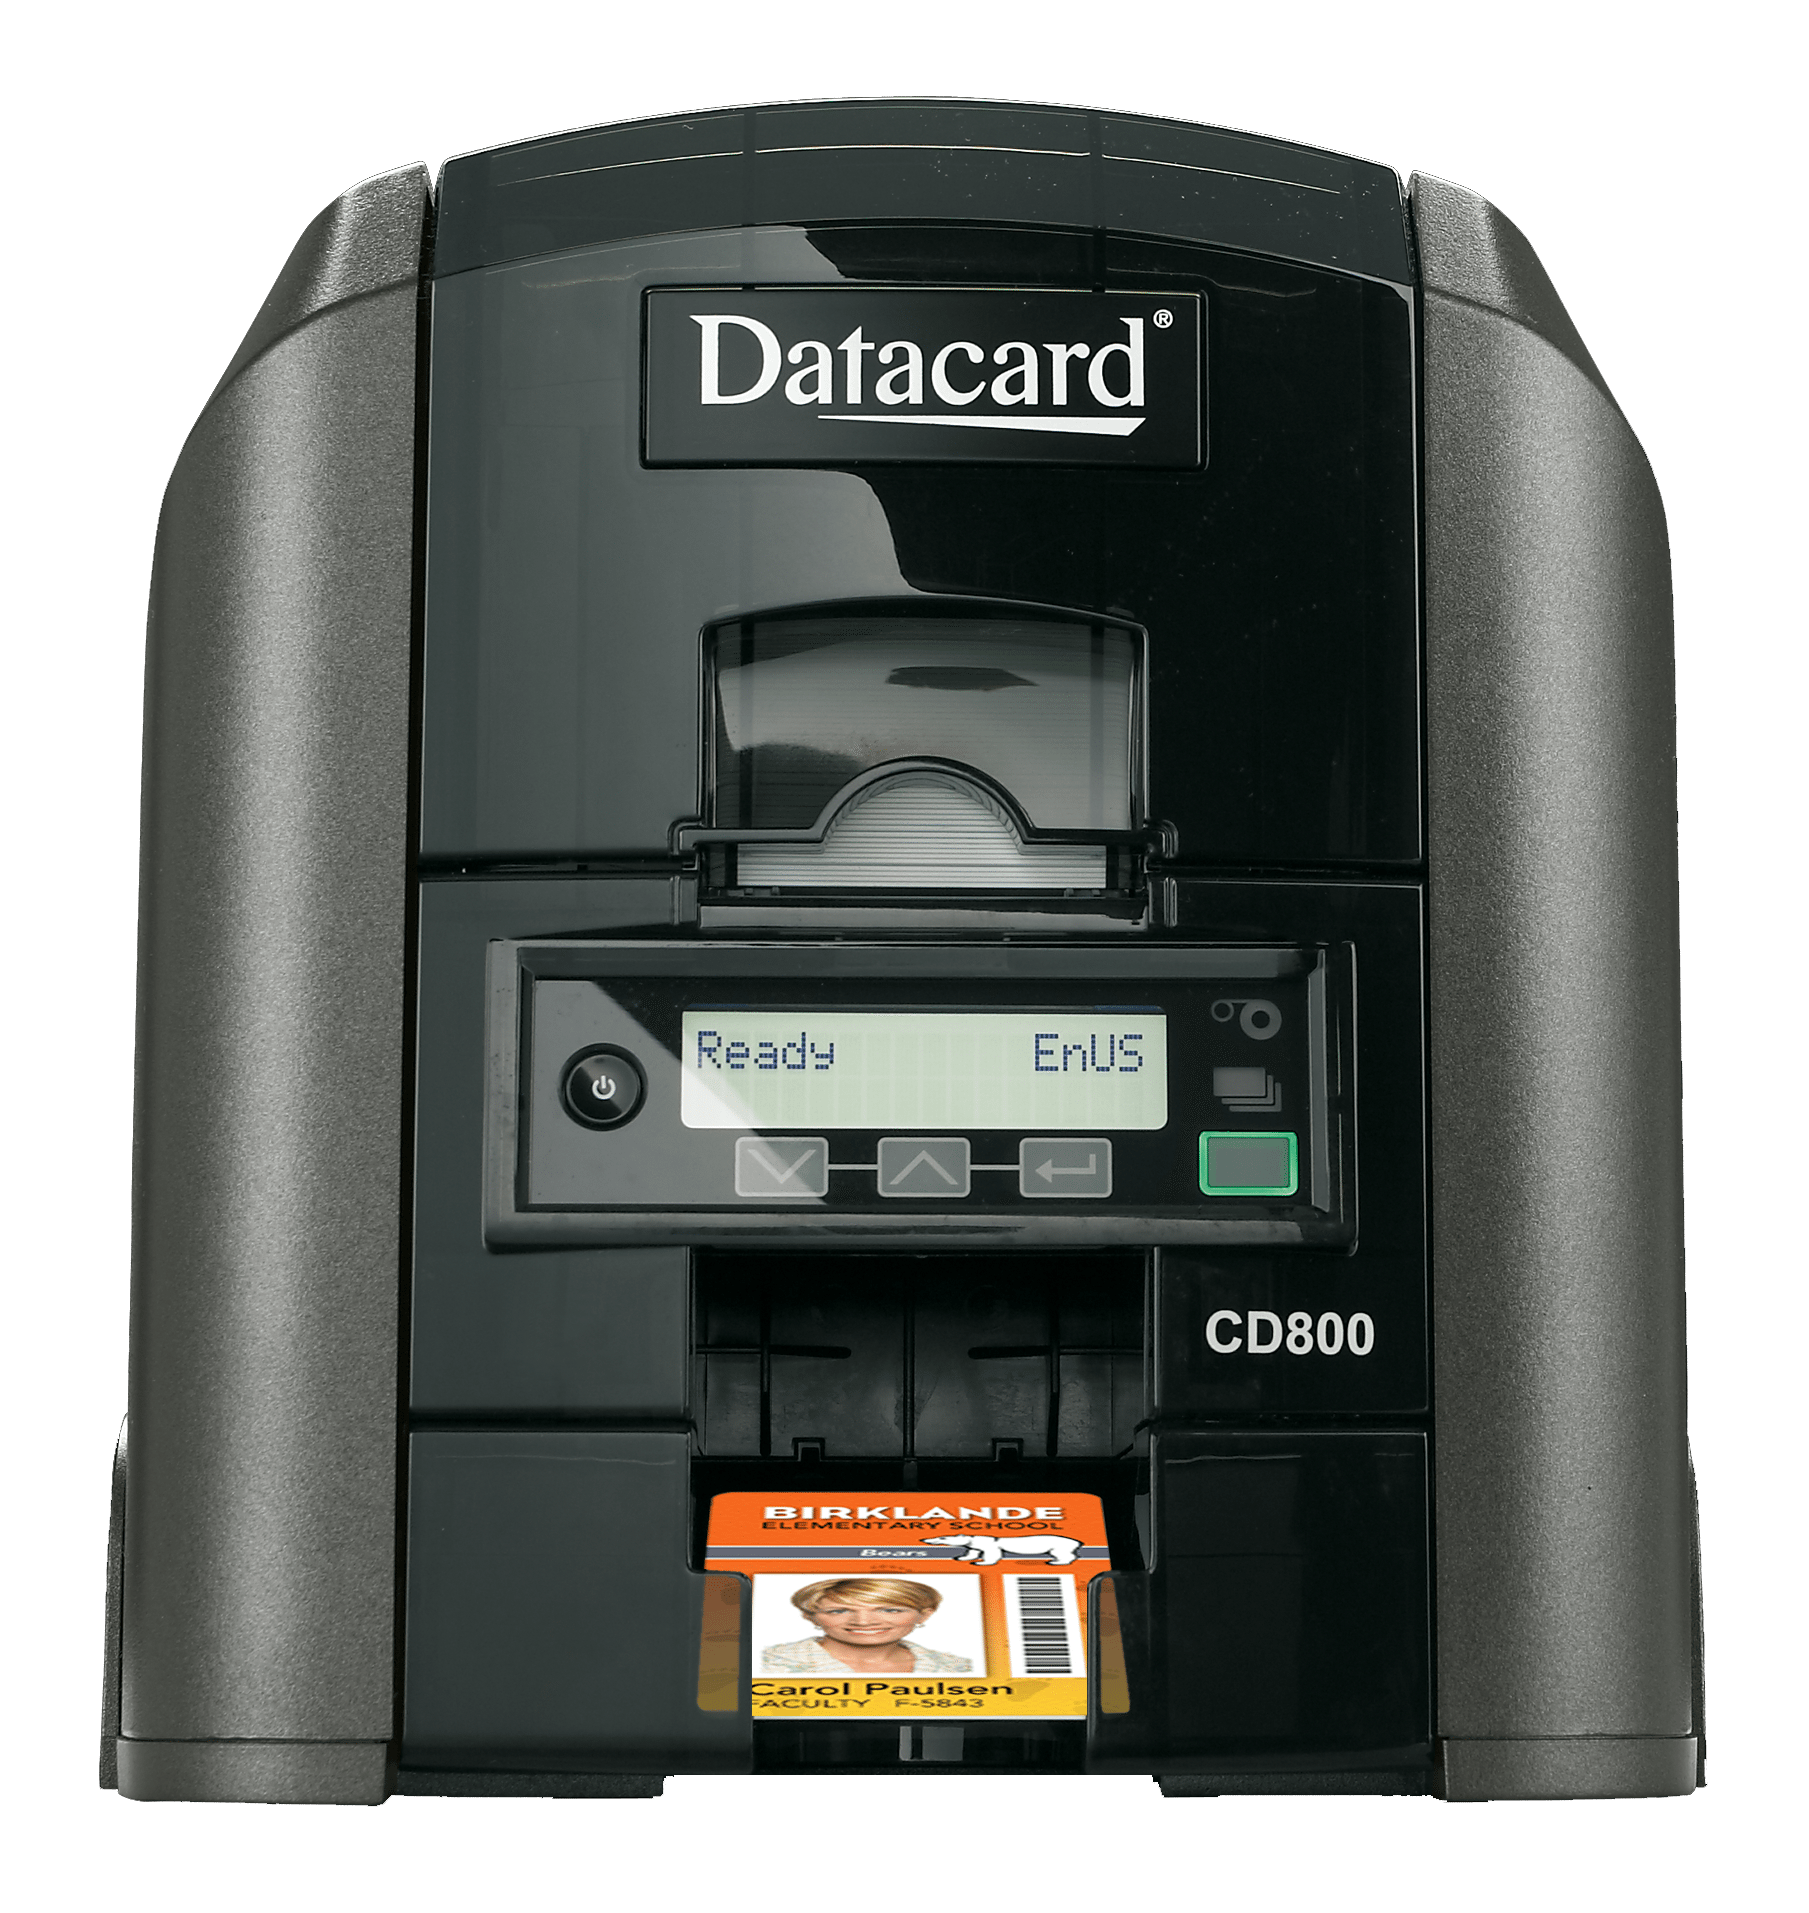 ID Card Issuanace Printer - Datacard CD800